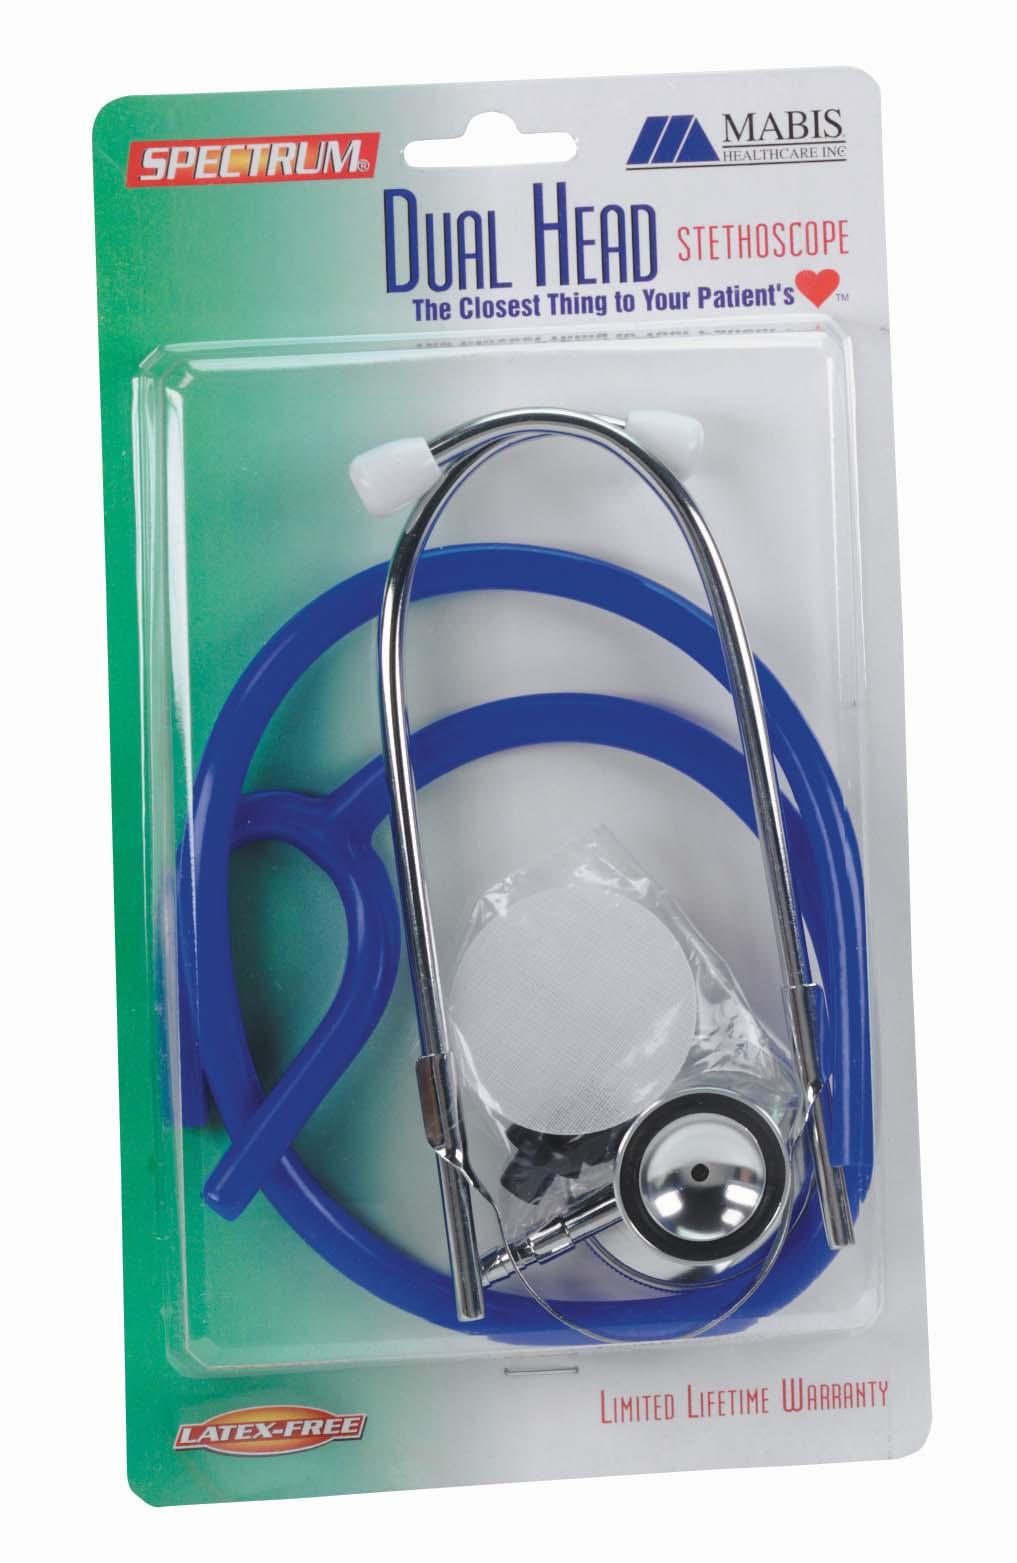 spectrum-dual-head-stethoscope-adult-slider-pack-burgundy-10-429-070-lr.jpg